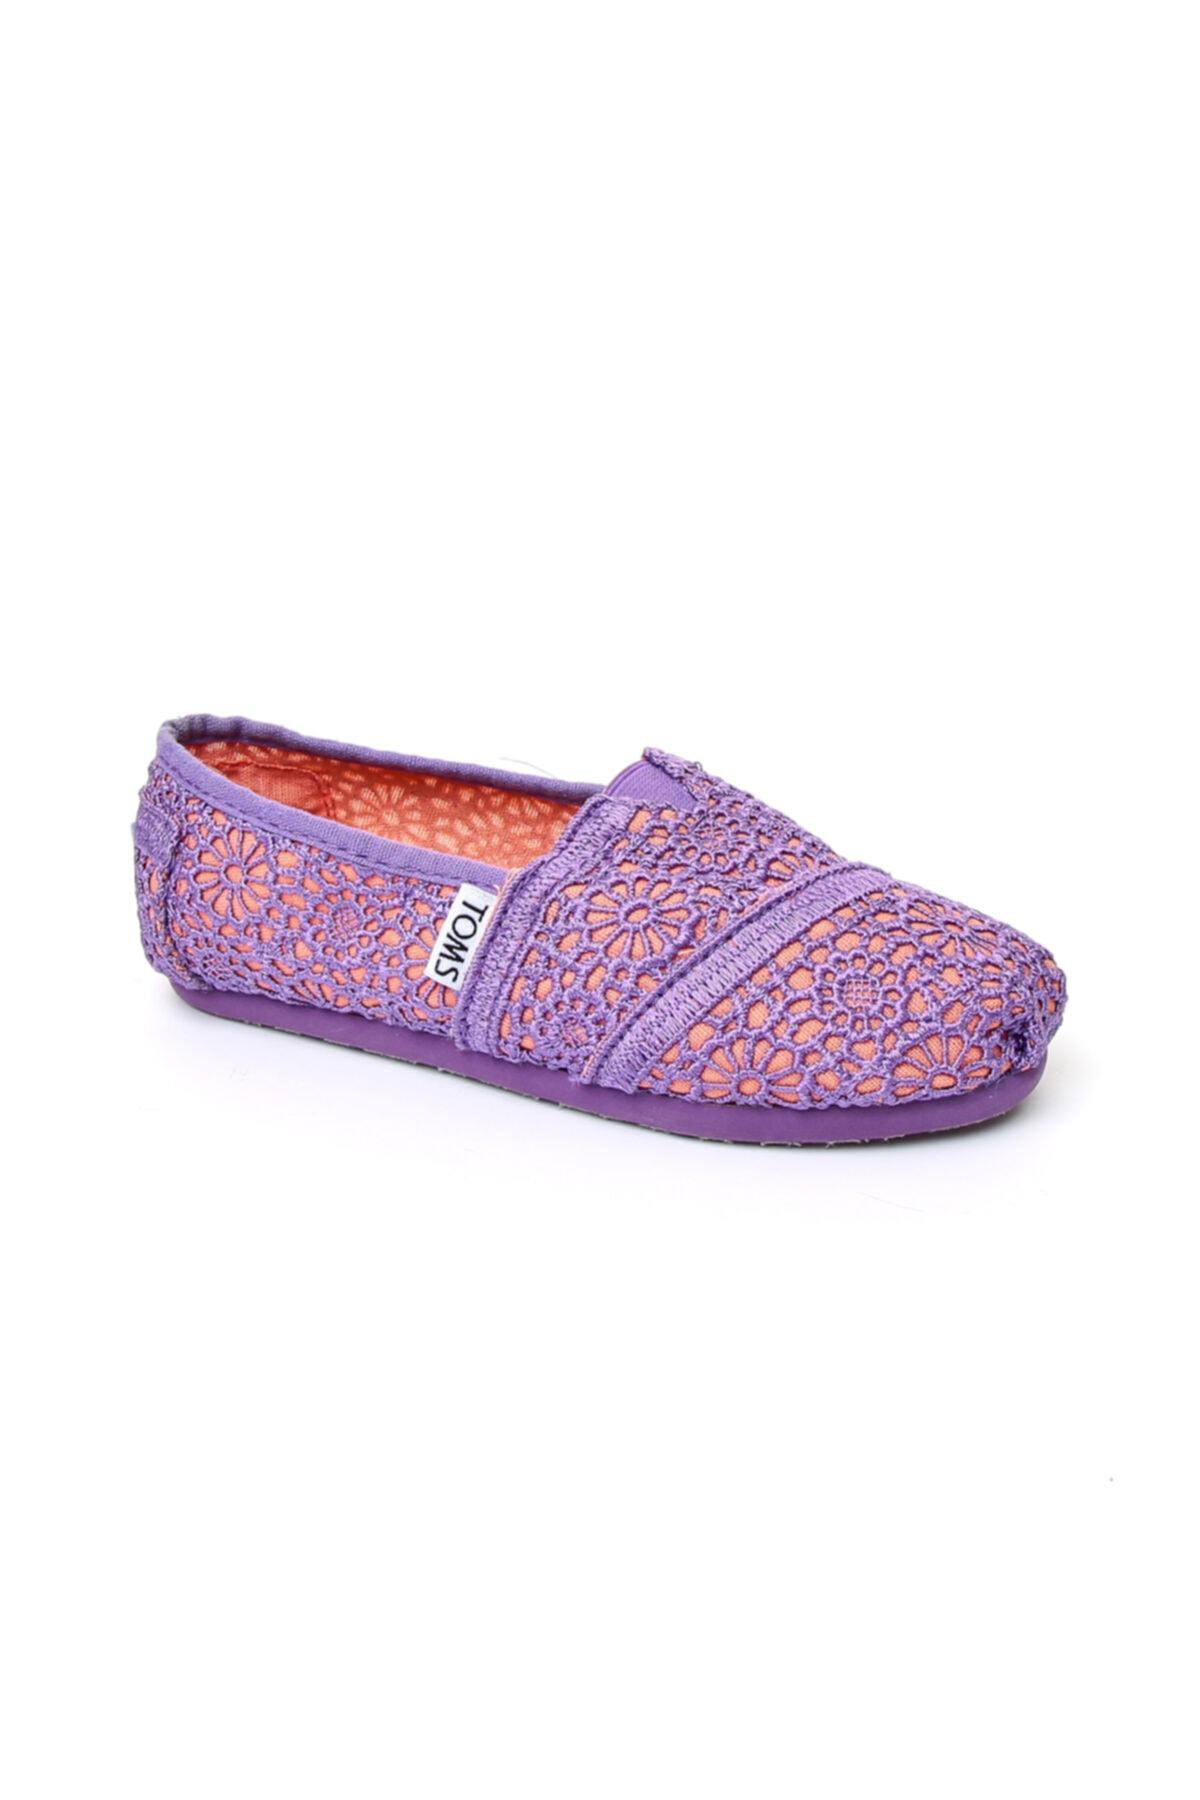 Pembe Kız Çocuk Slip On / Bağcıksız 10001926 Purple-Orange Corchet / Porang